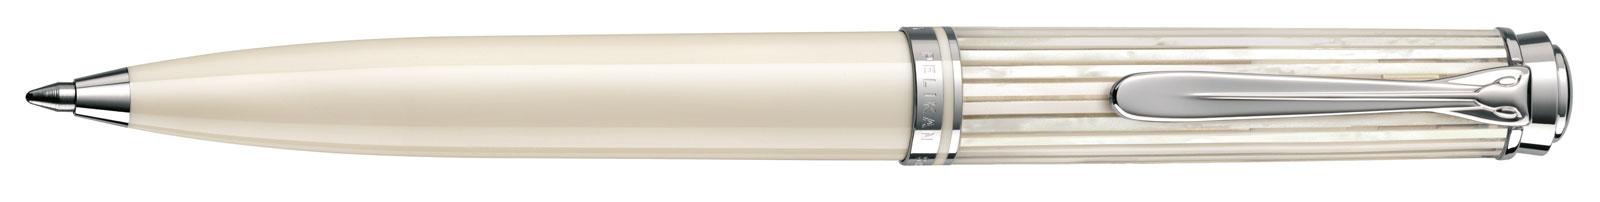 Pelikan Souverän White Transparant Special Edition Balpoint Pen